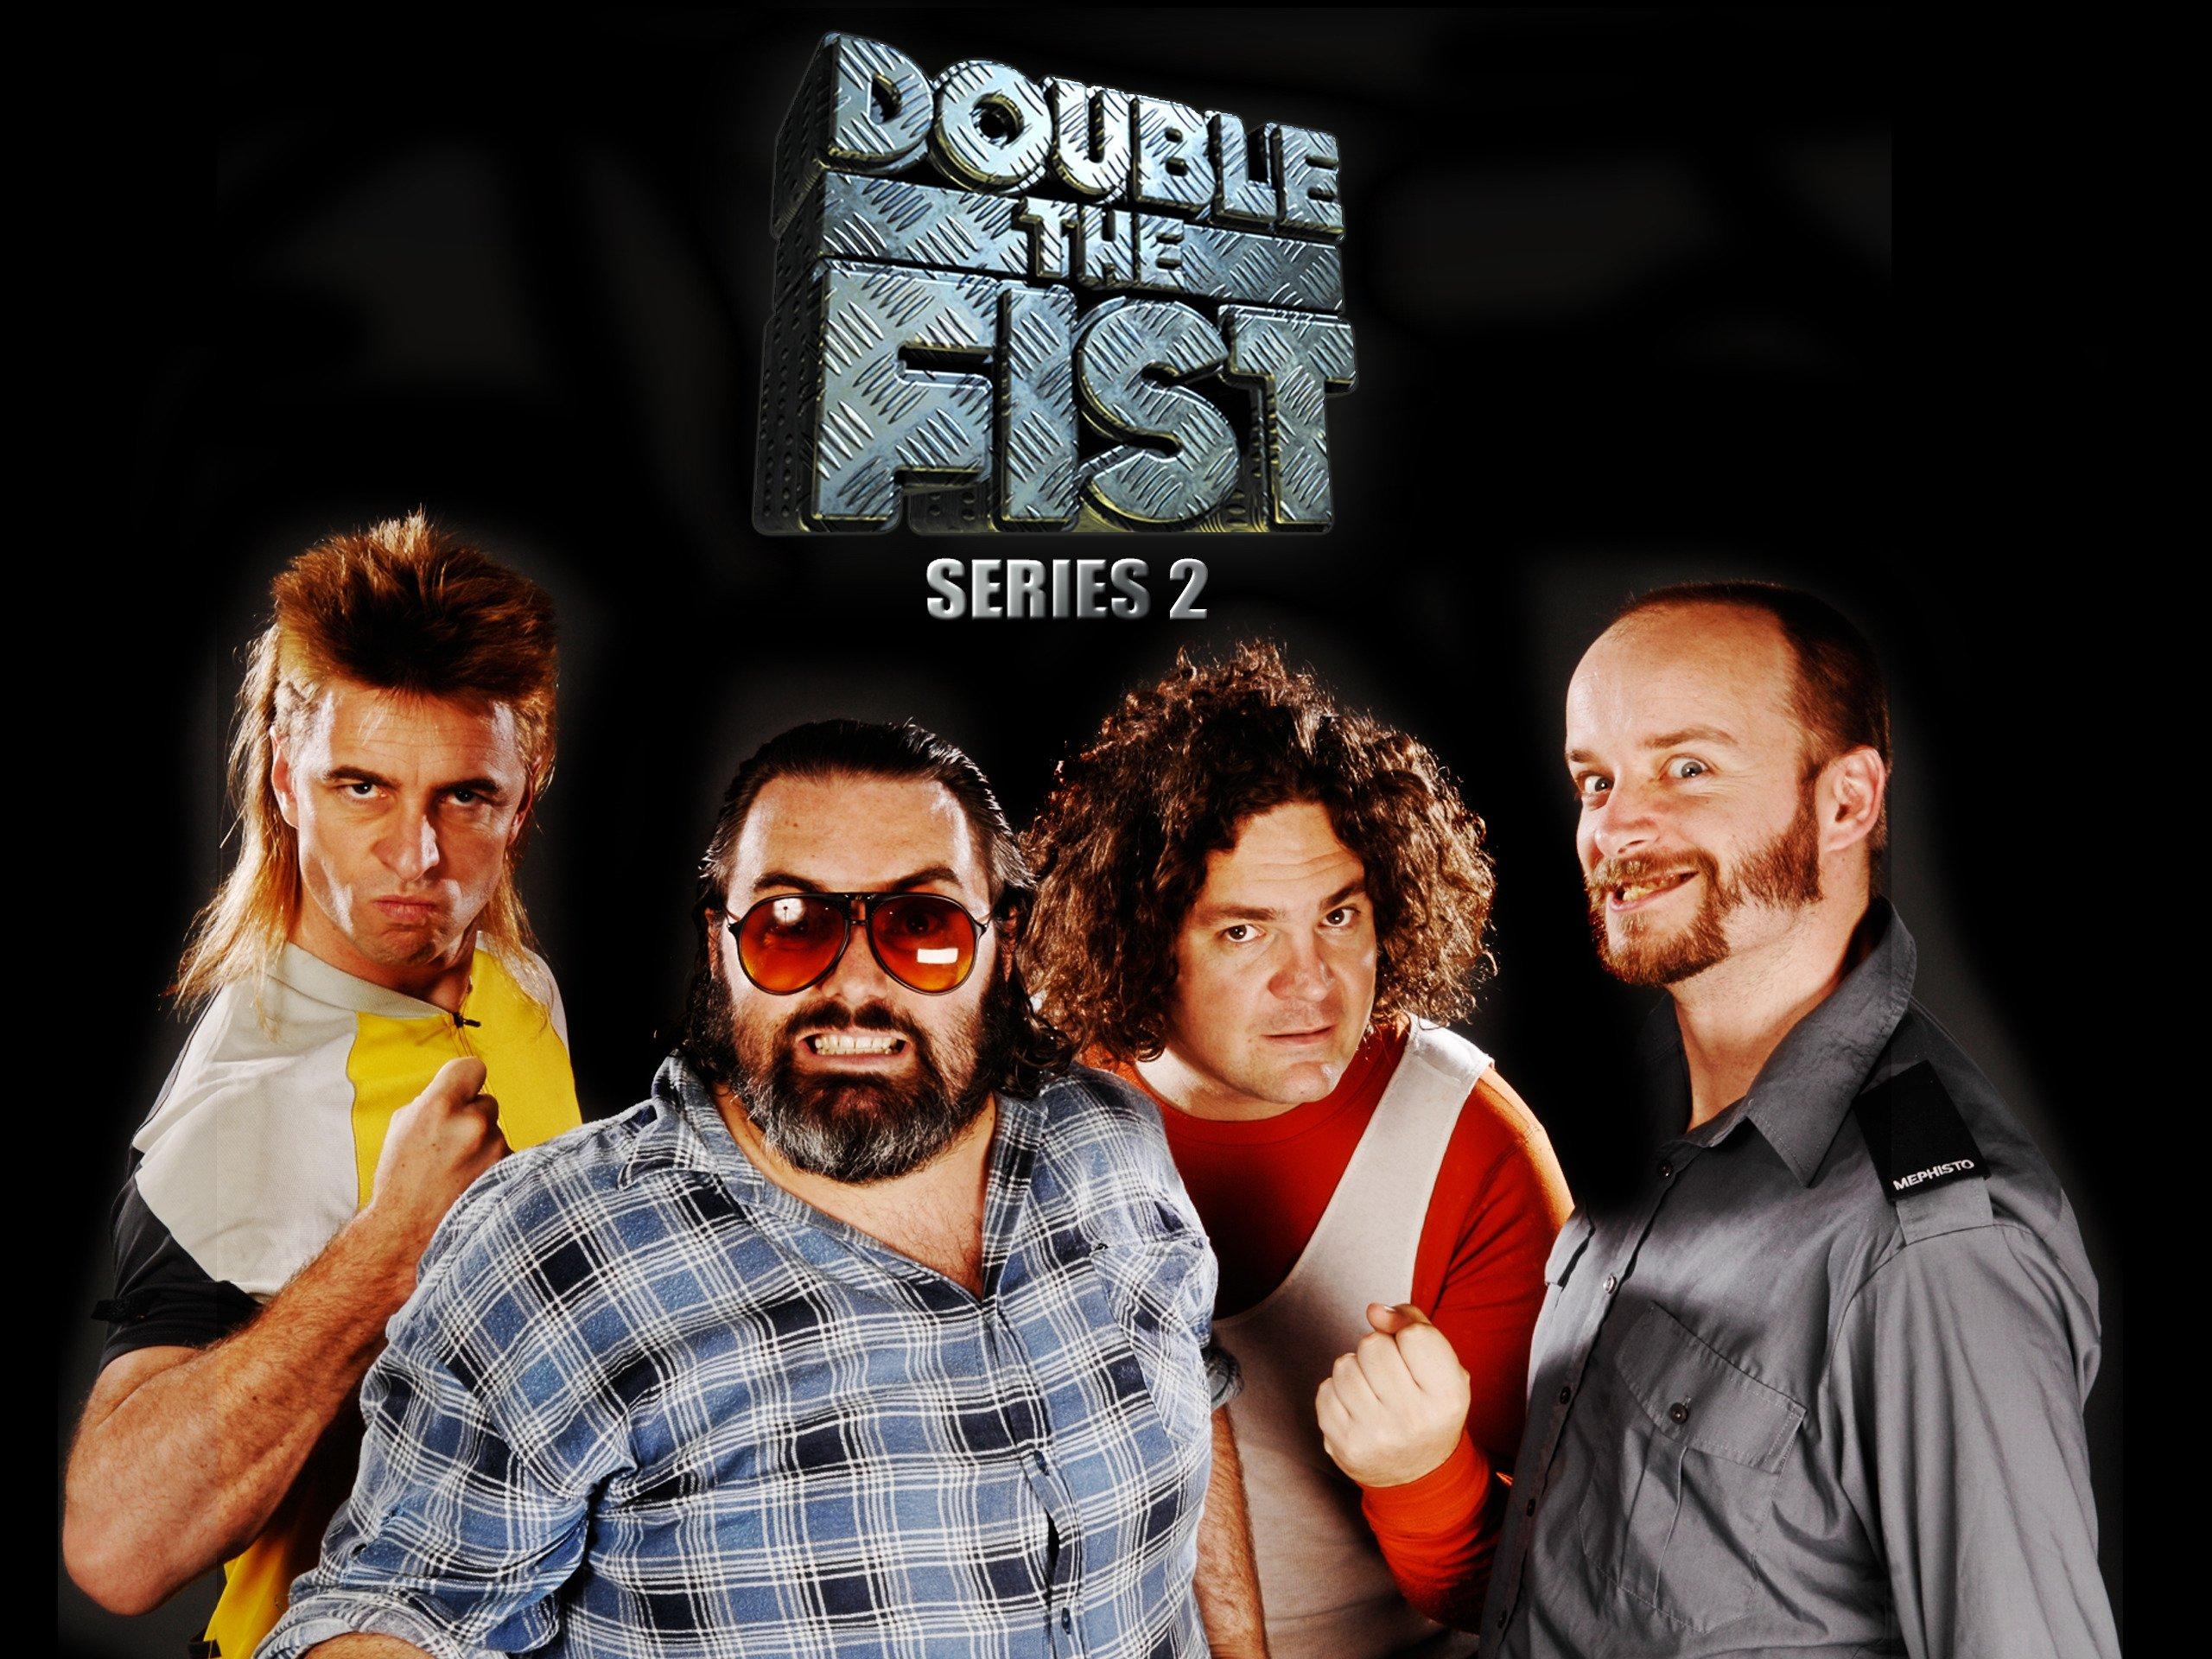 You were double the fist season 2 good idea